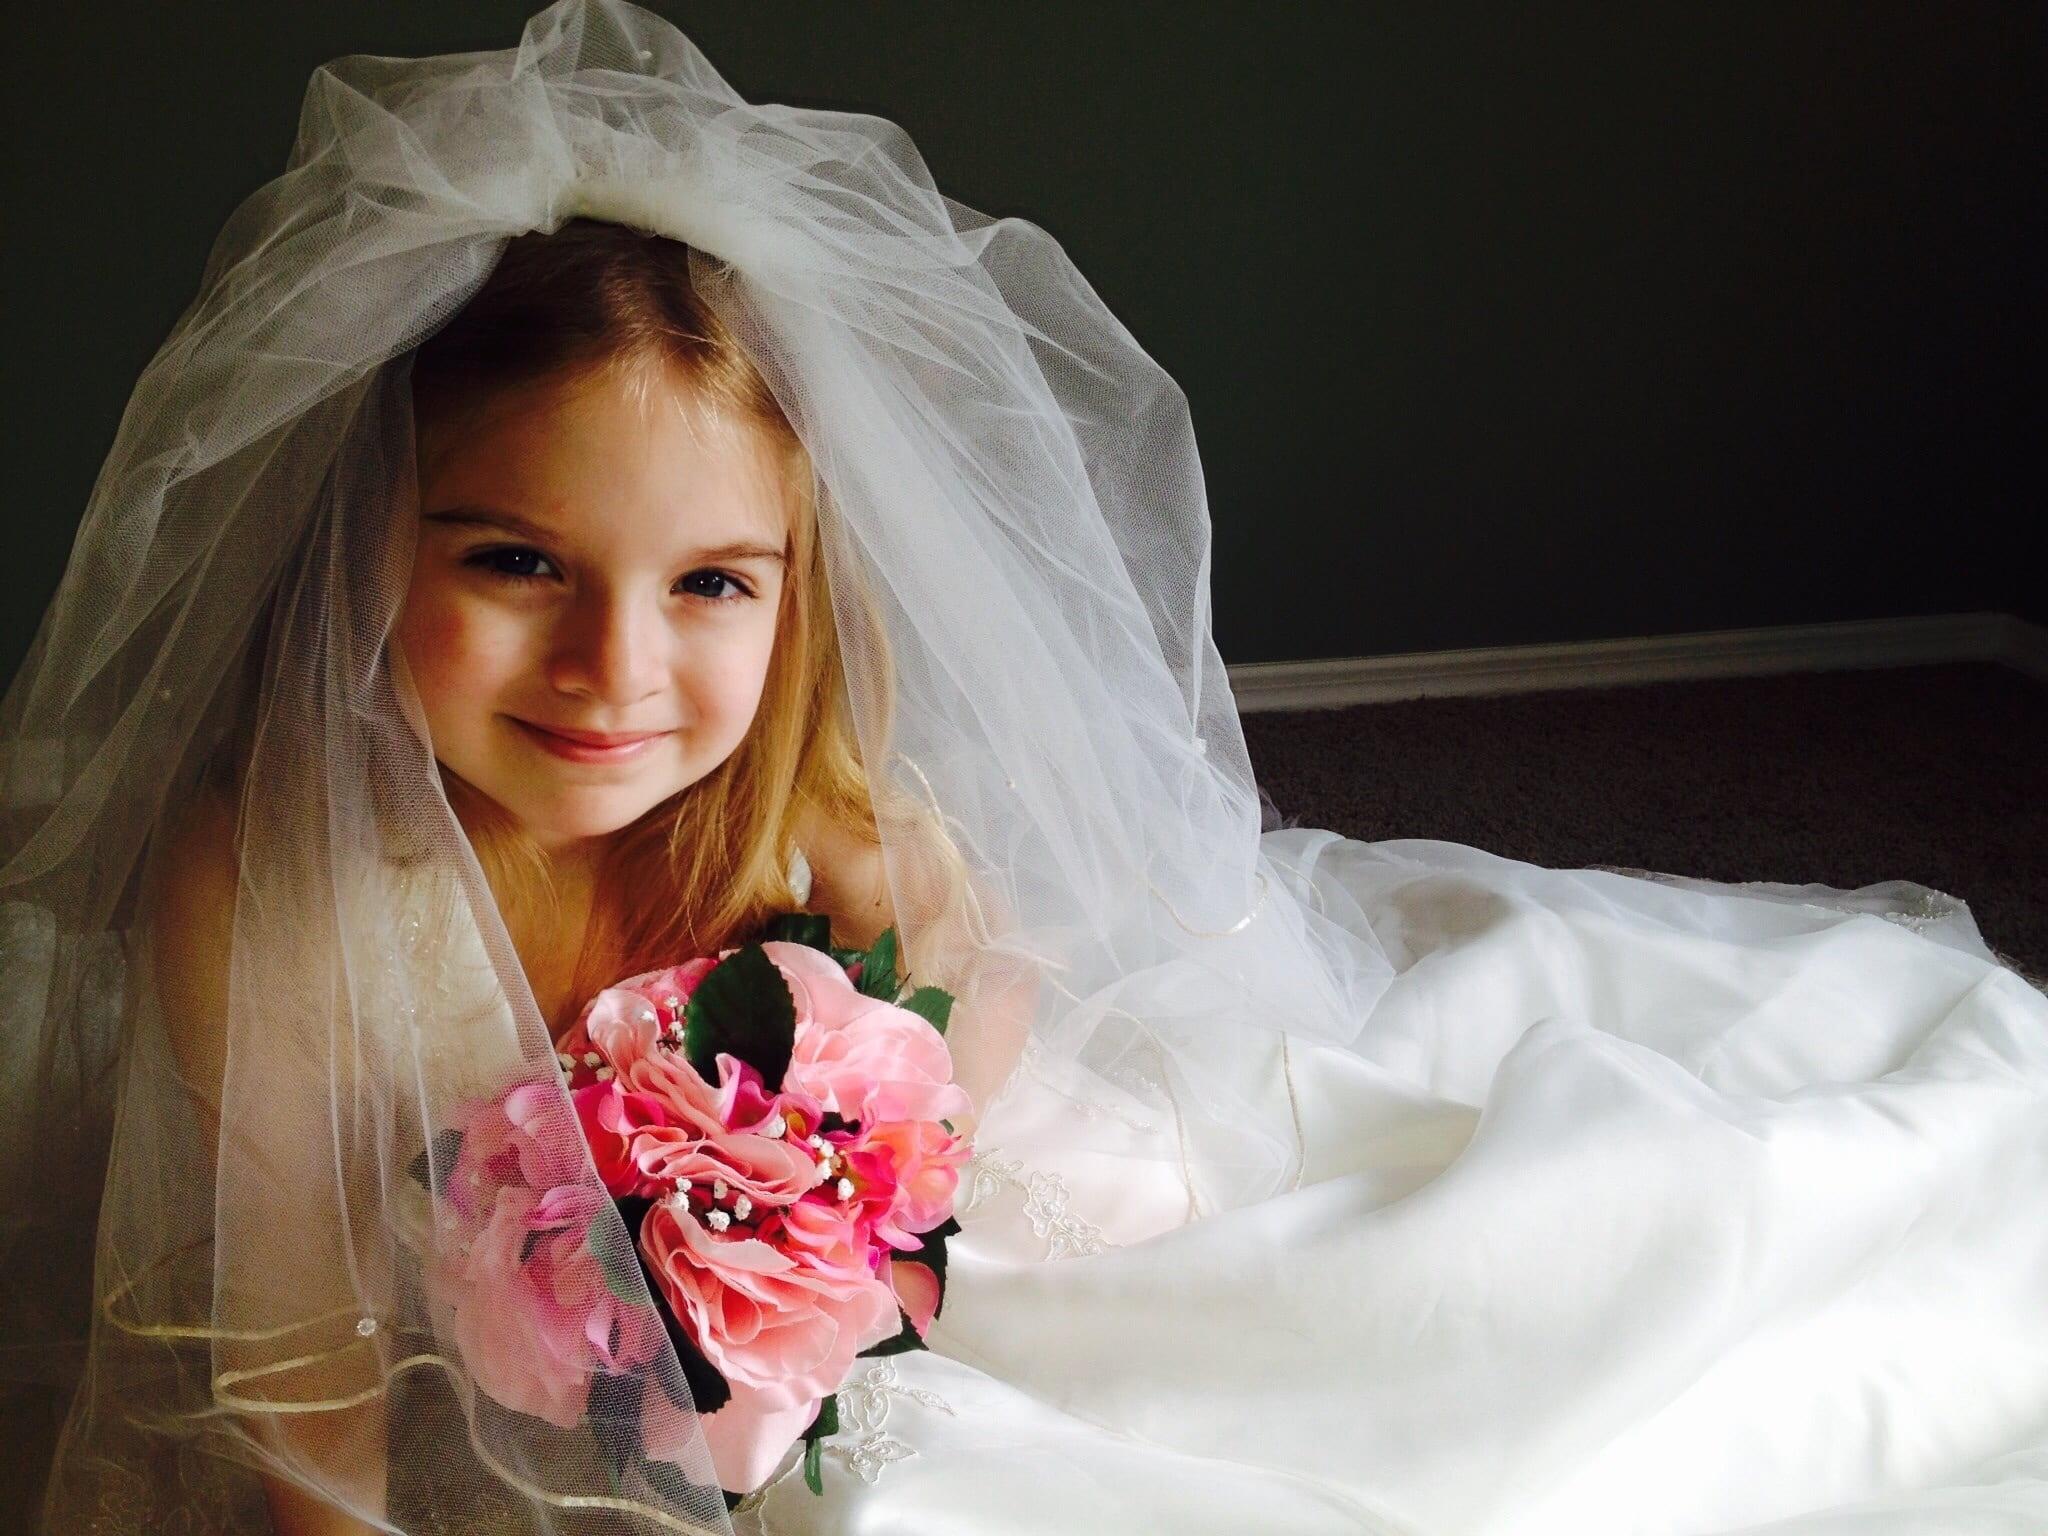 Girl wearing a wedding dress. Source: Amy Ann Brockmeyer, pixabay.com